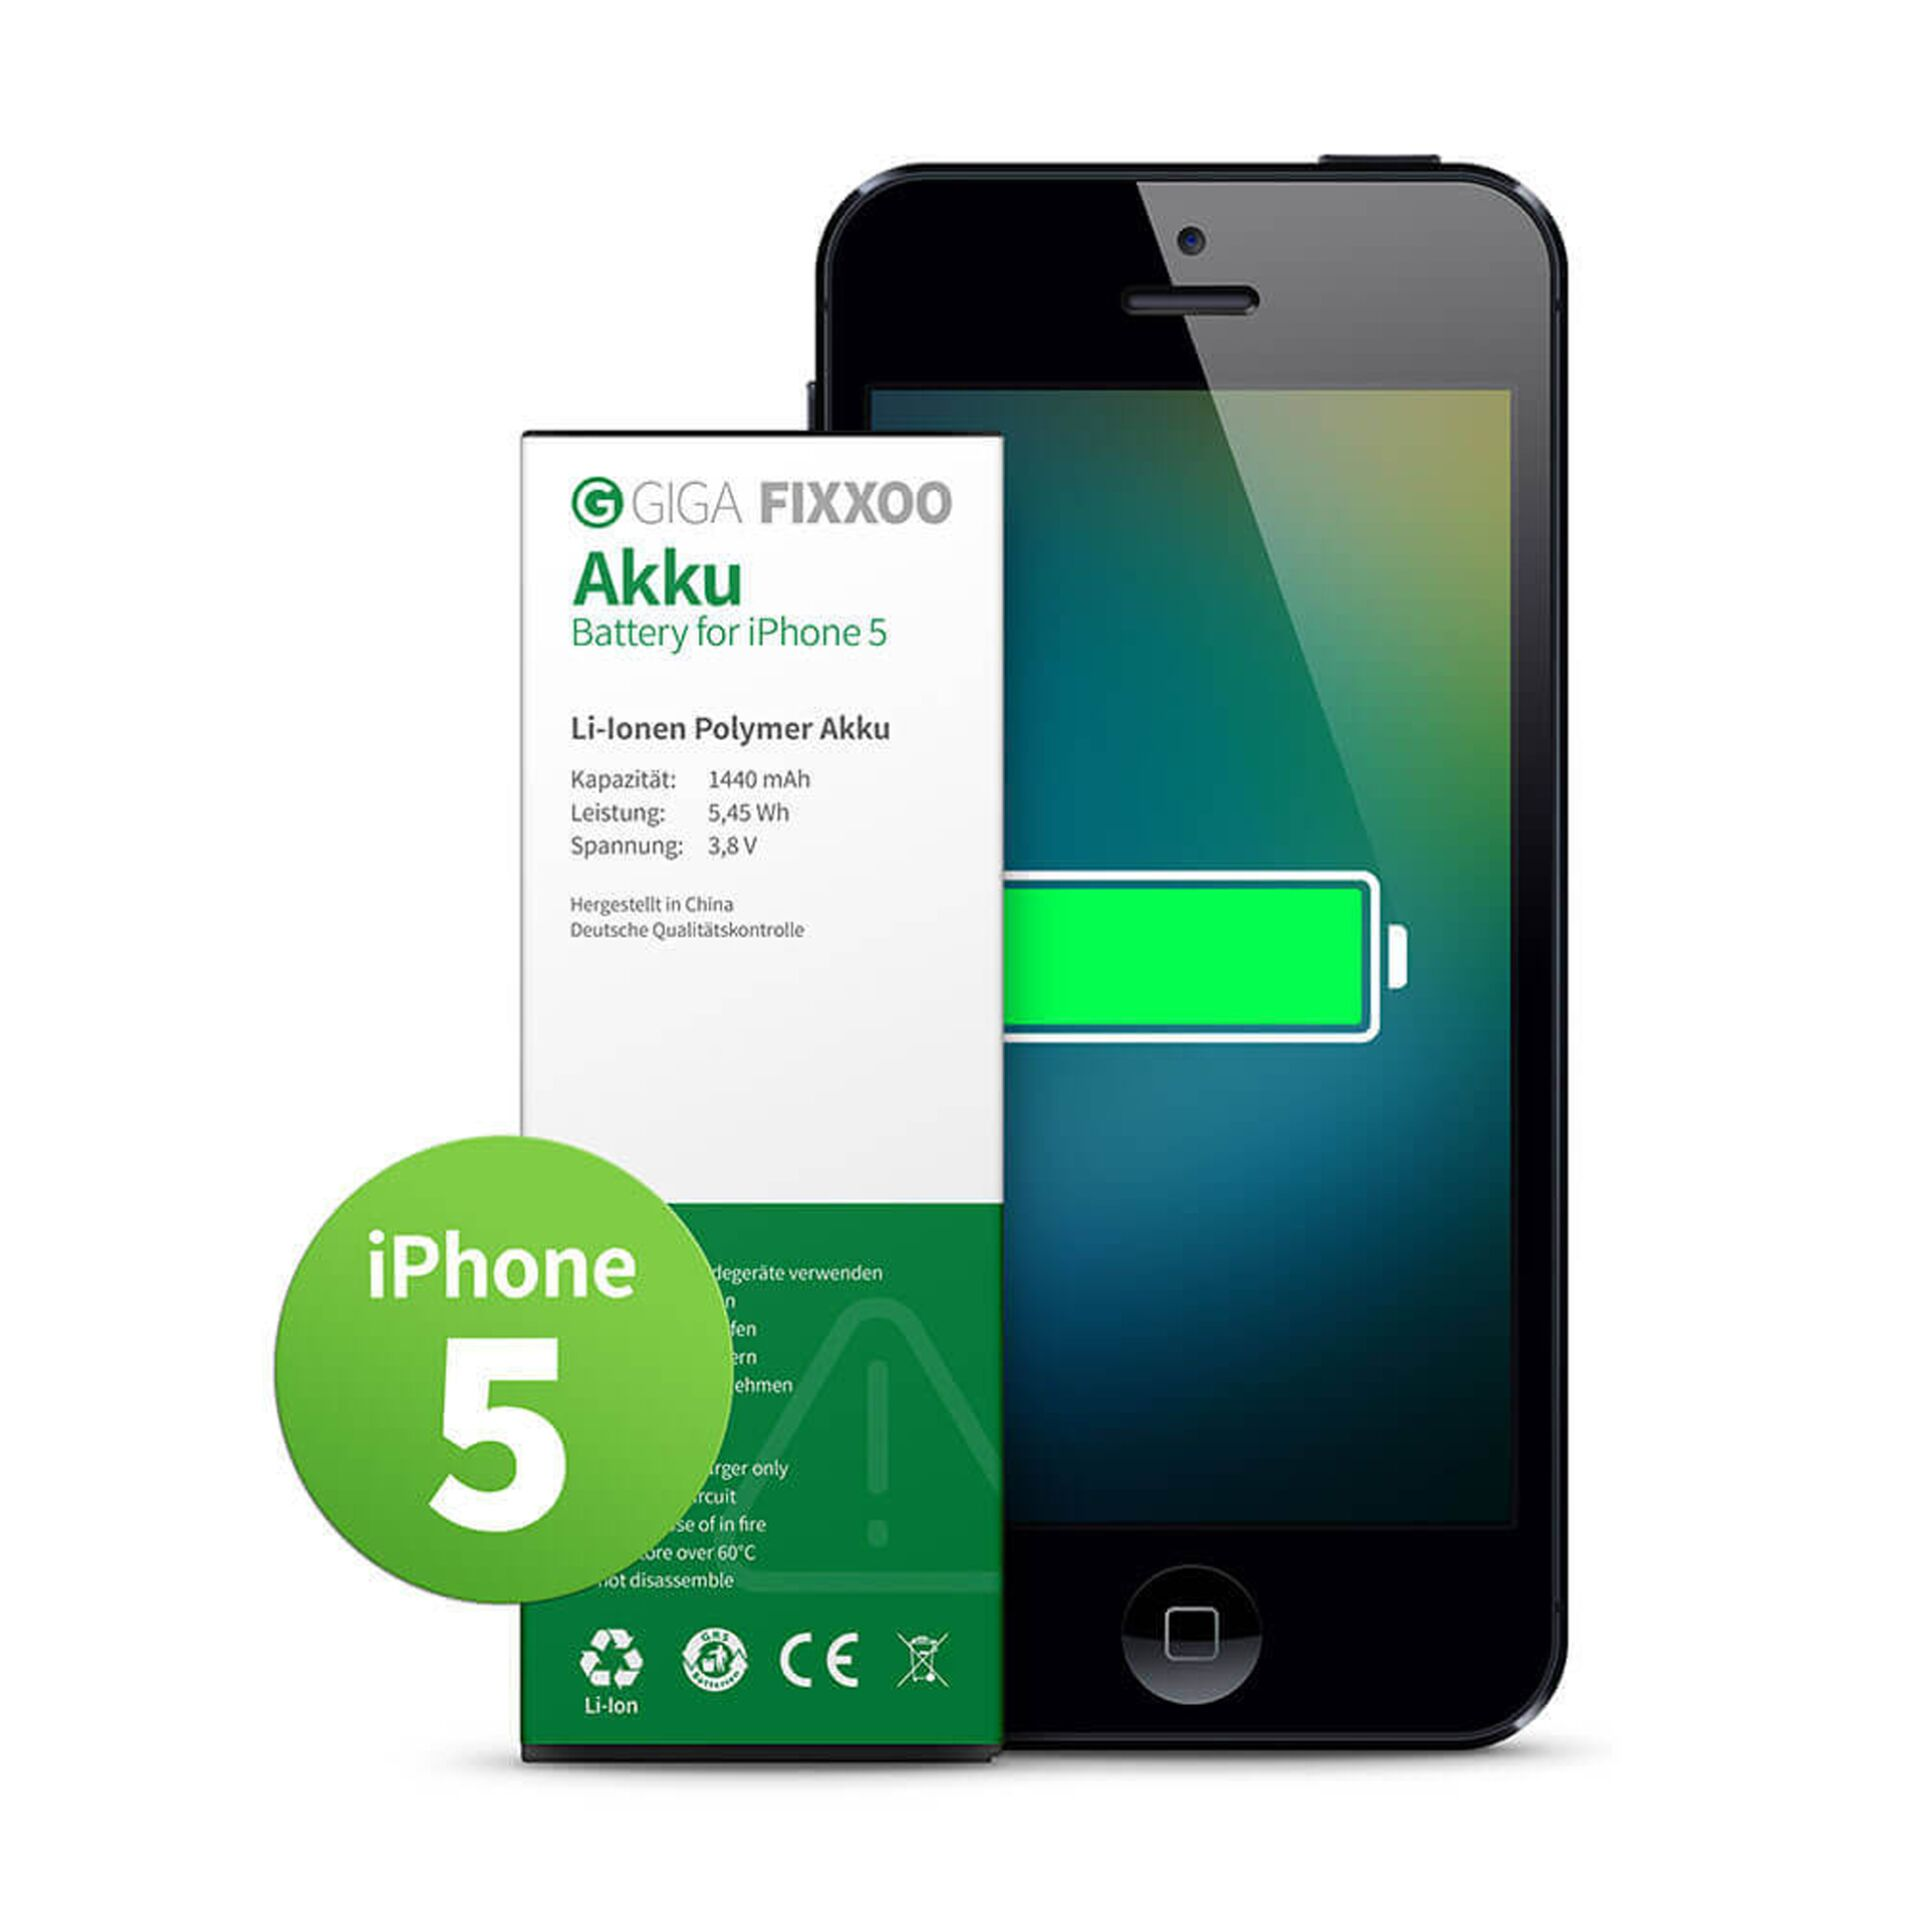 GIGA Fixxoo iPhone 5 Akku